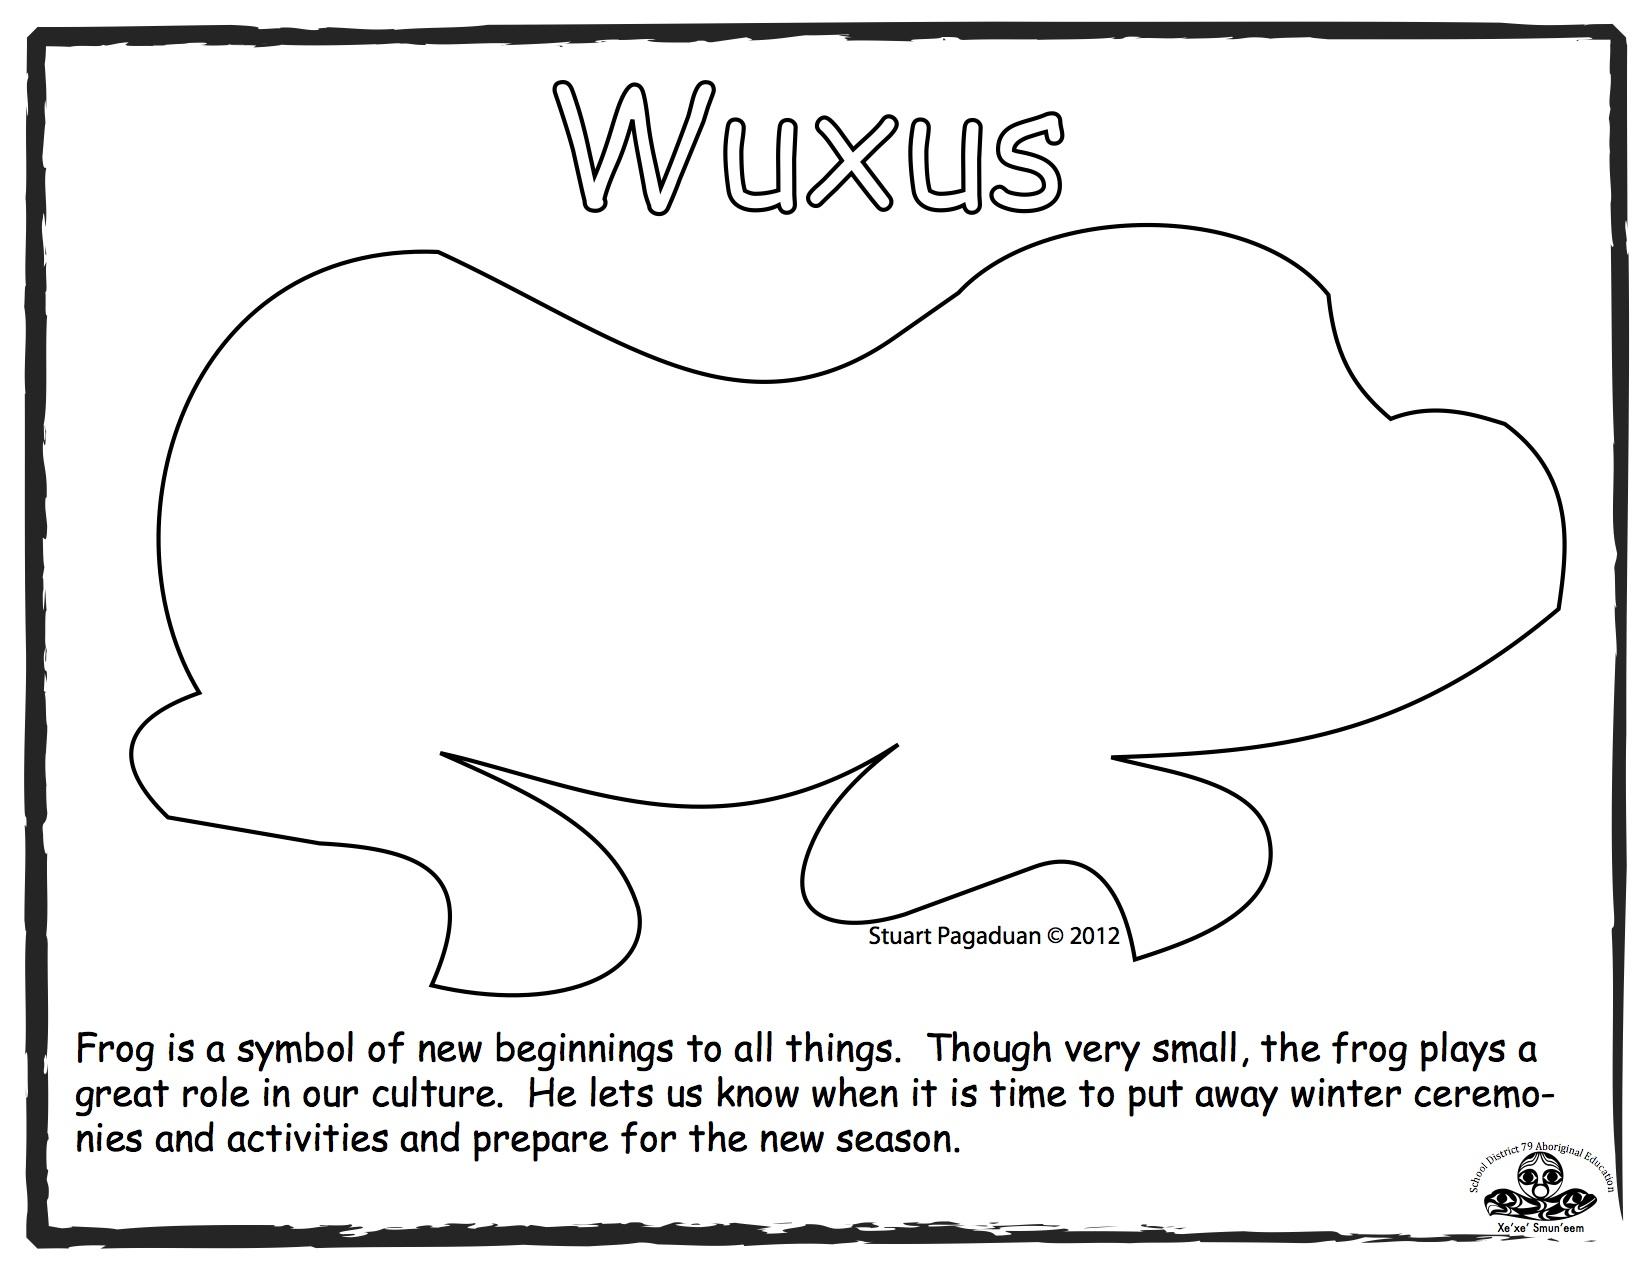 frog-wuxus-outline